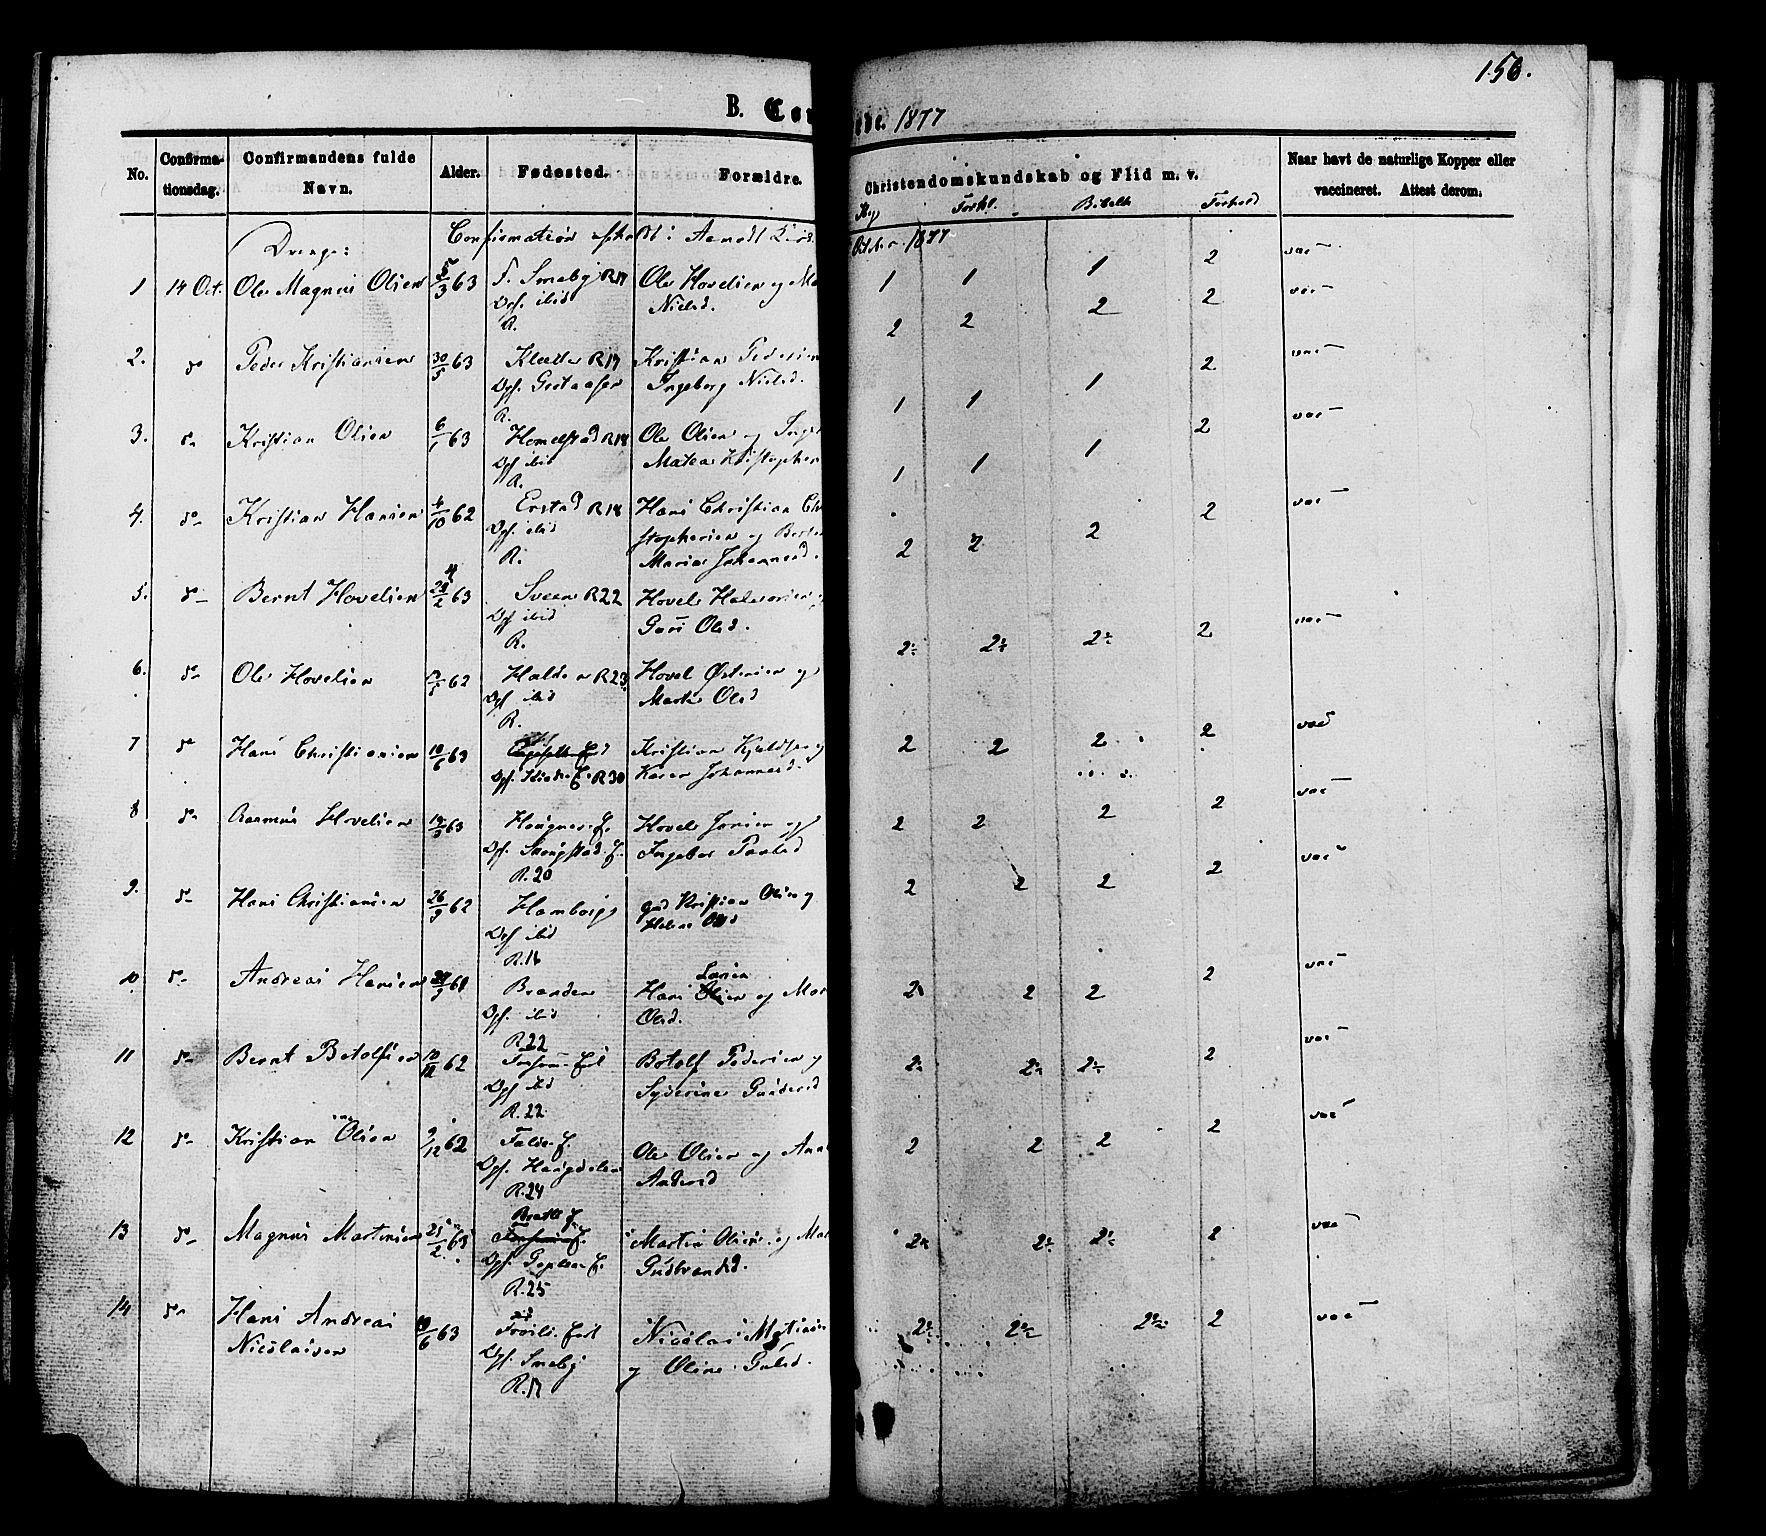 SAH, Nordre Land prestekontor, Ministerialbok nr. 2, 1872-1881, s. 156